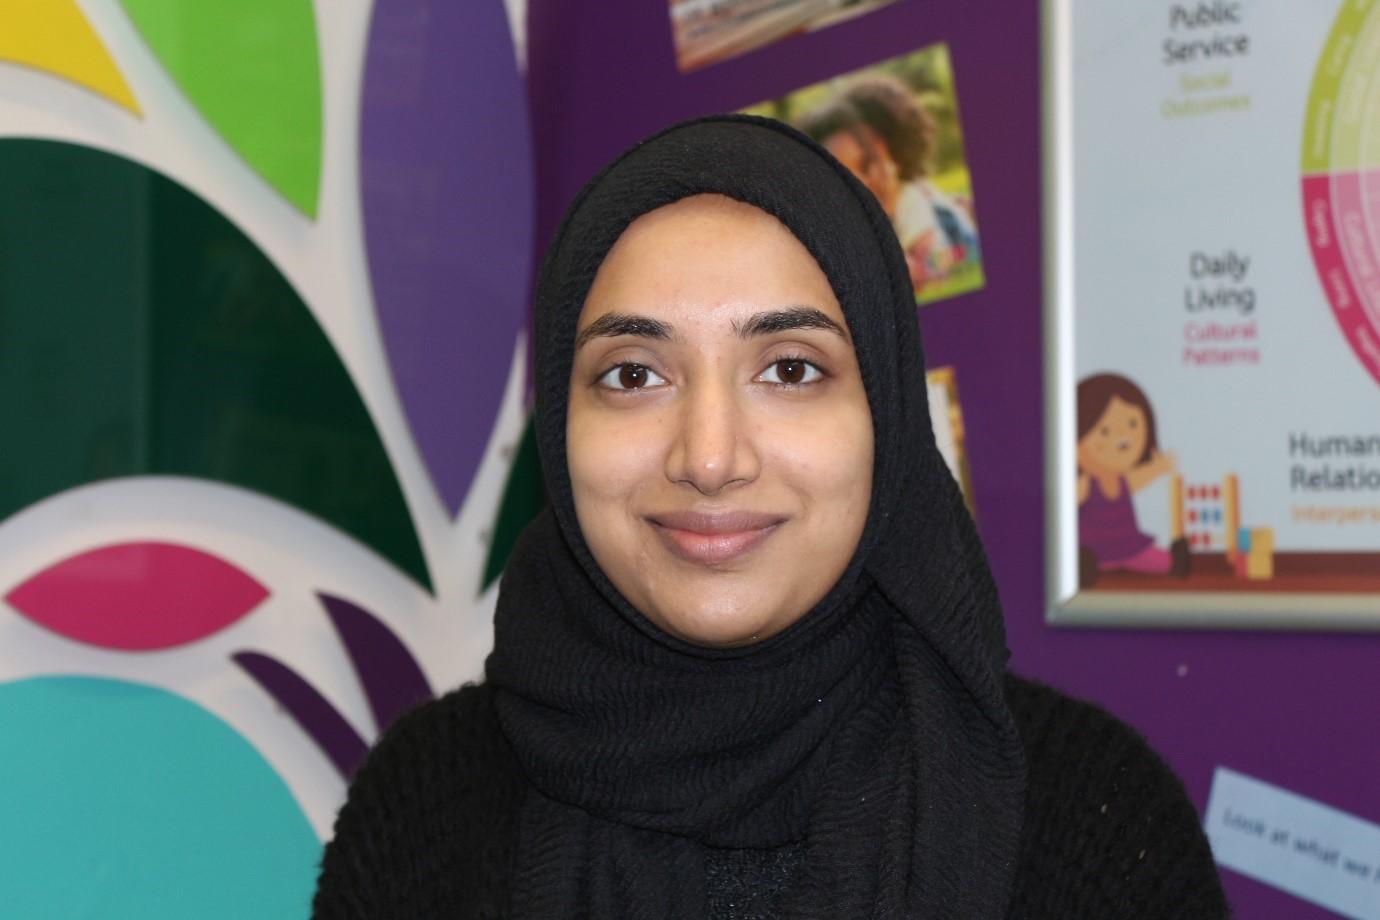 Mu'allimah Anisa Patel